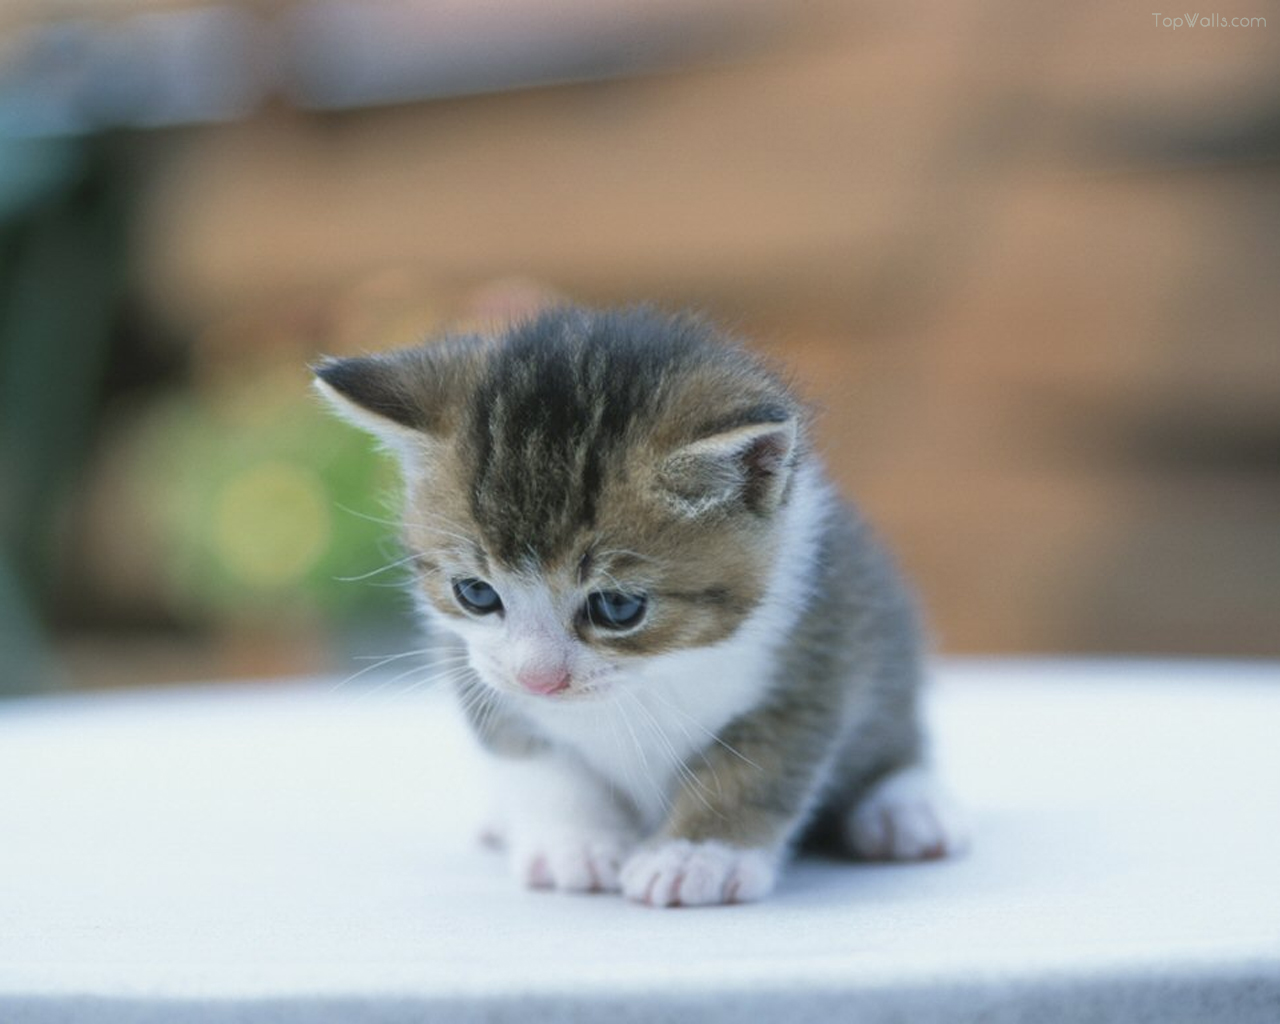 Ivanildosantos Gambar Kucing Yang Lucu